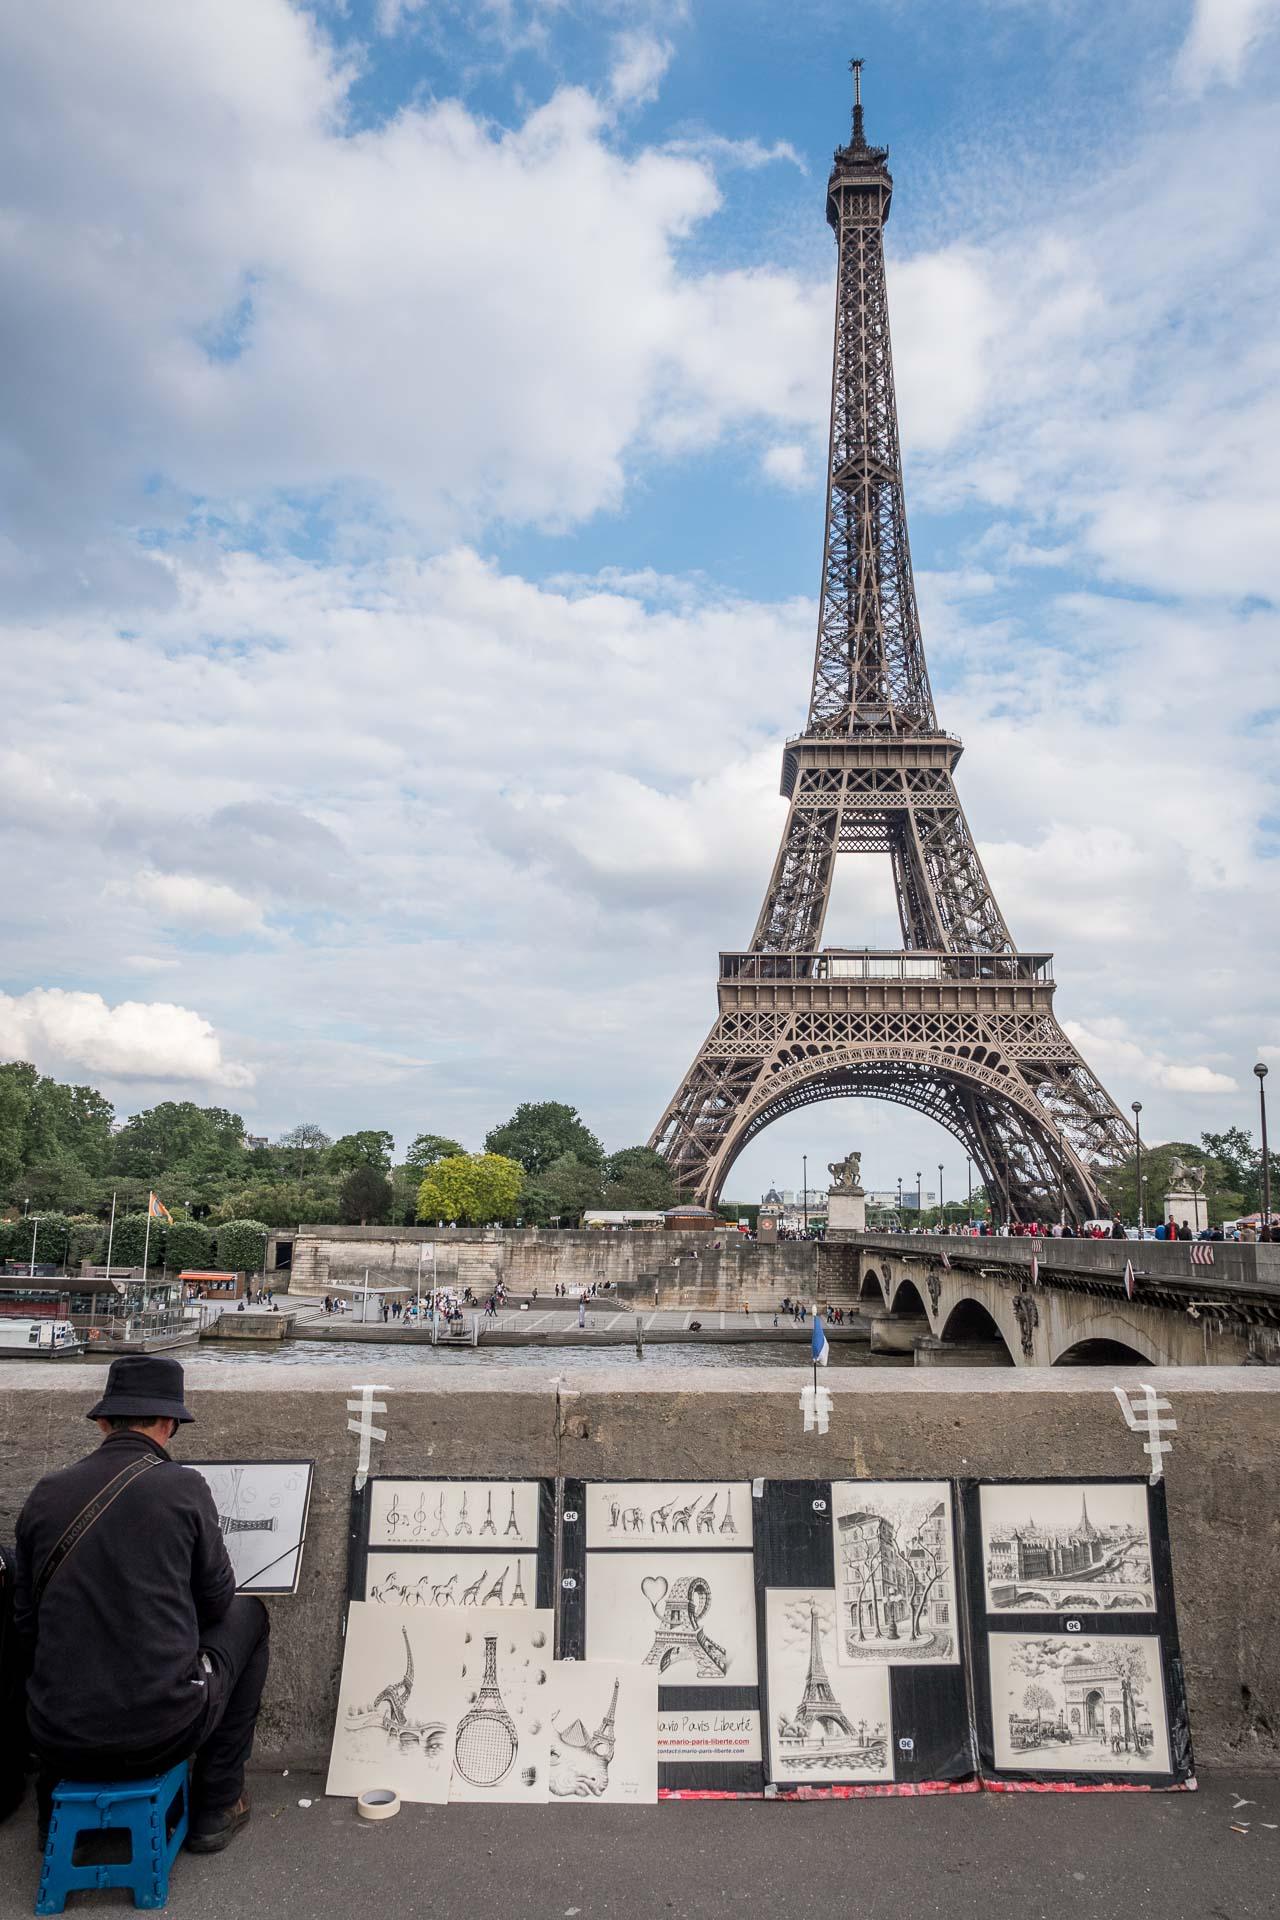 Paris Reisetipps: Eiffelturm Maler